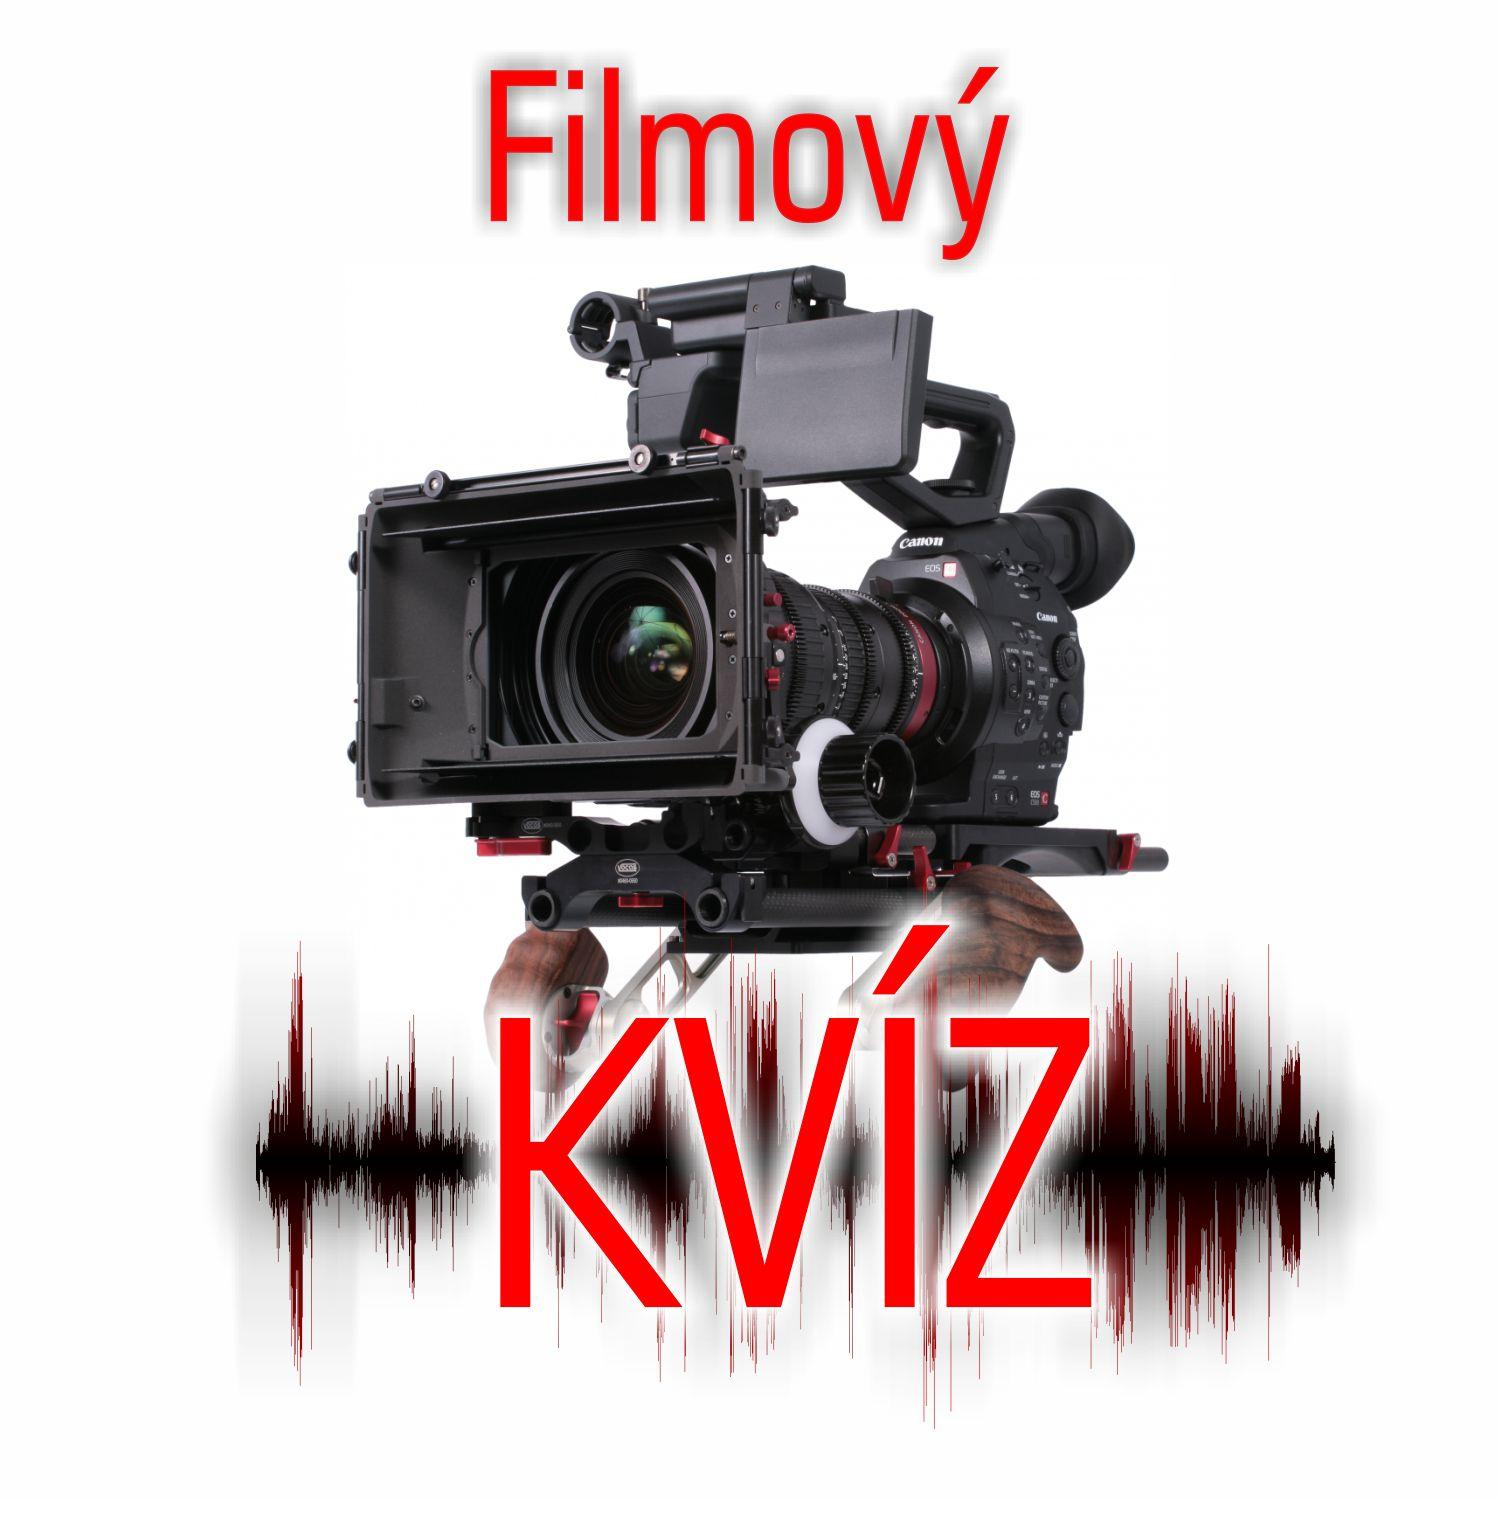 Filmový KVÍZ s hostem: Jirka Korynta